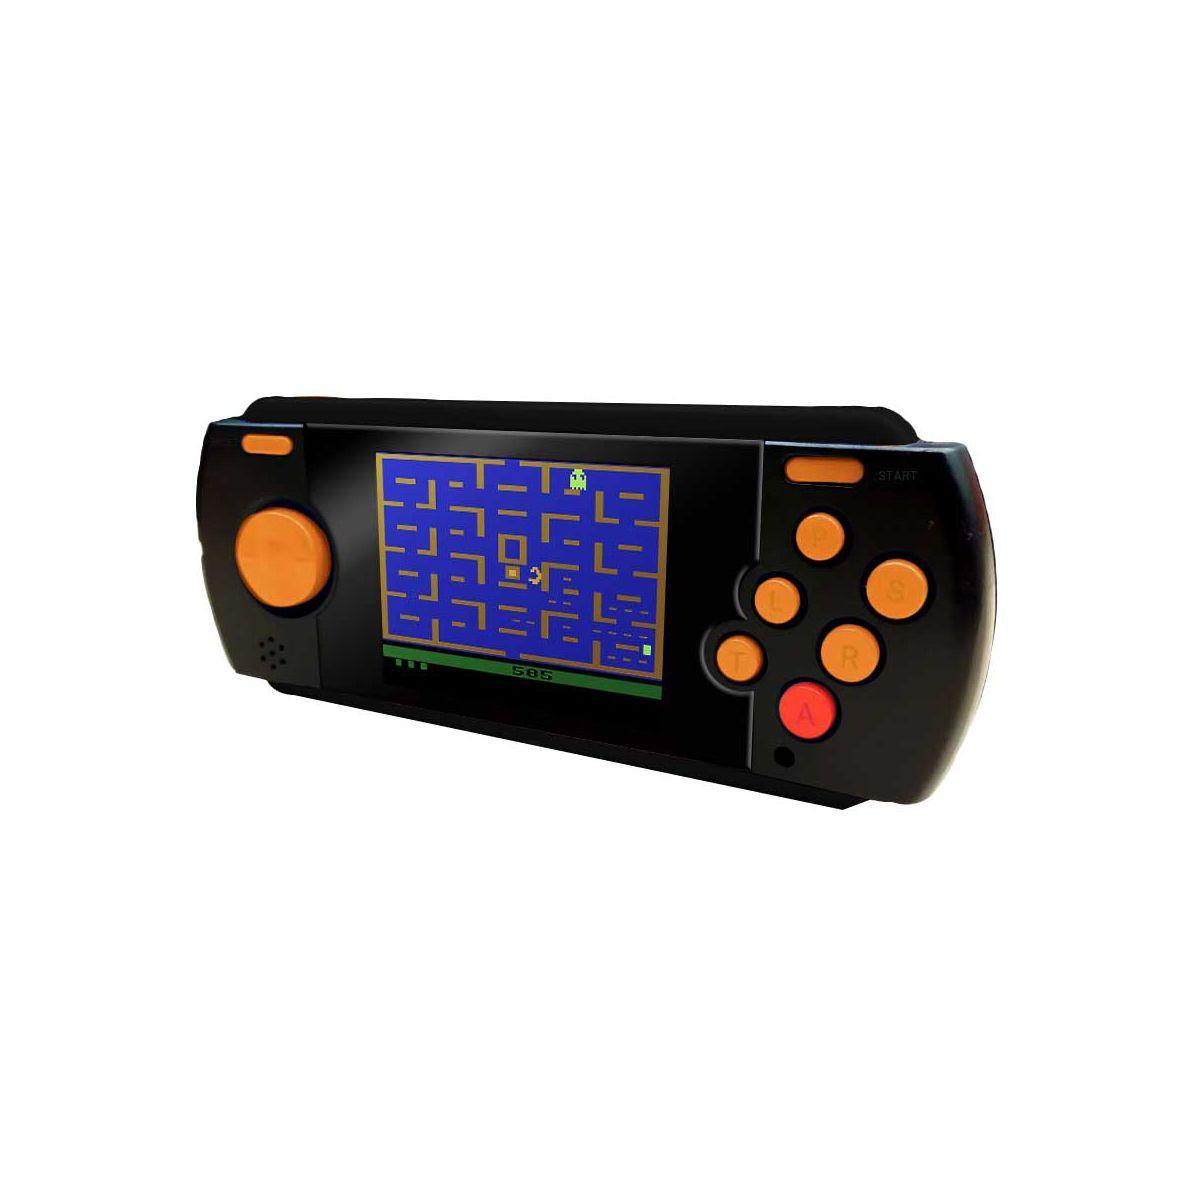 Console r�tro e-concept atari flashback 8 classic 70 jeux - 2% de remise imm�diate avec le code : school2 (photo)